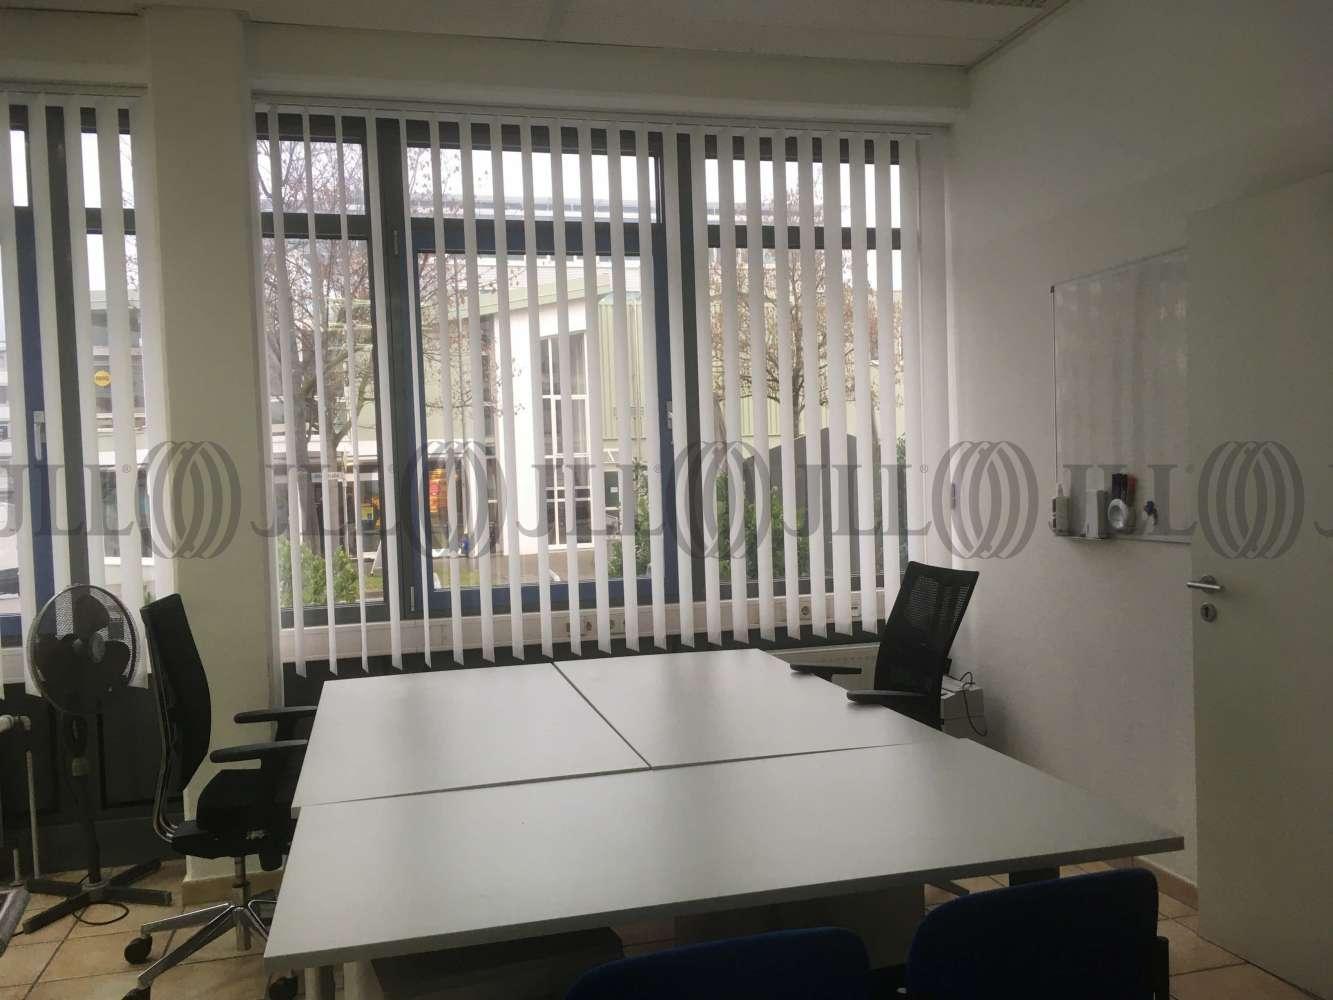 Büros Leinfelden-echterdingen, 70771 - Büro - Leinfelden-Echterdingen, Echterdingen - S0076 - 10905753